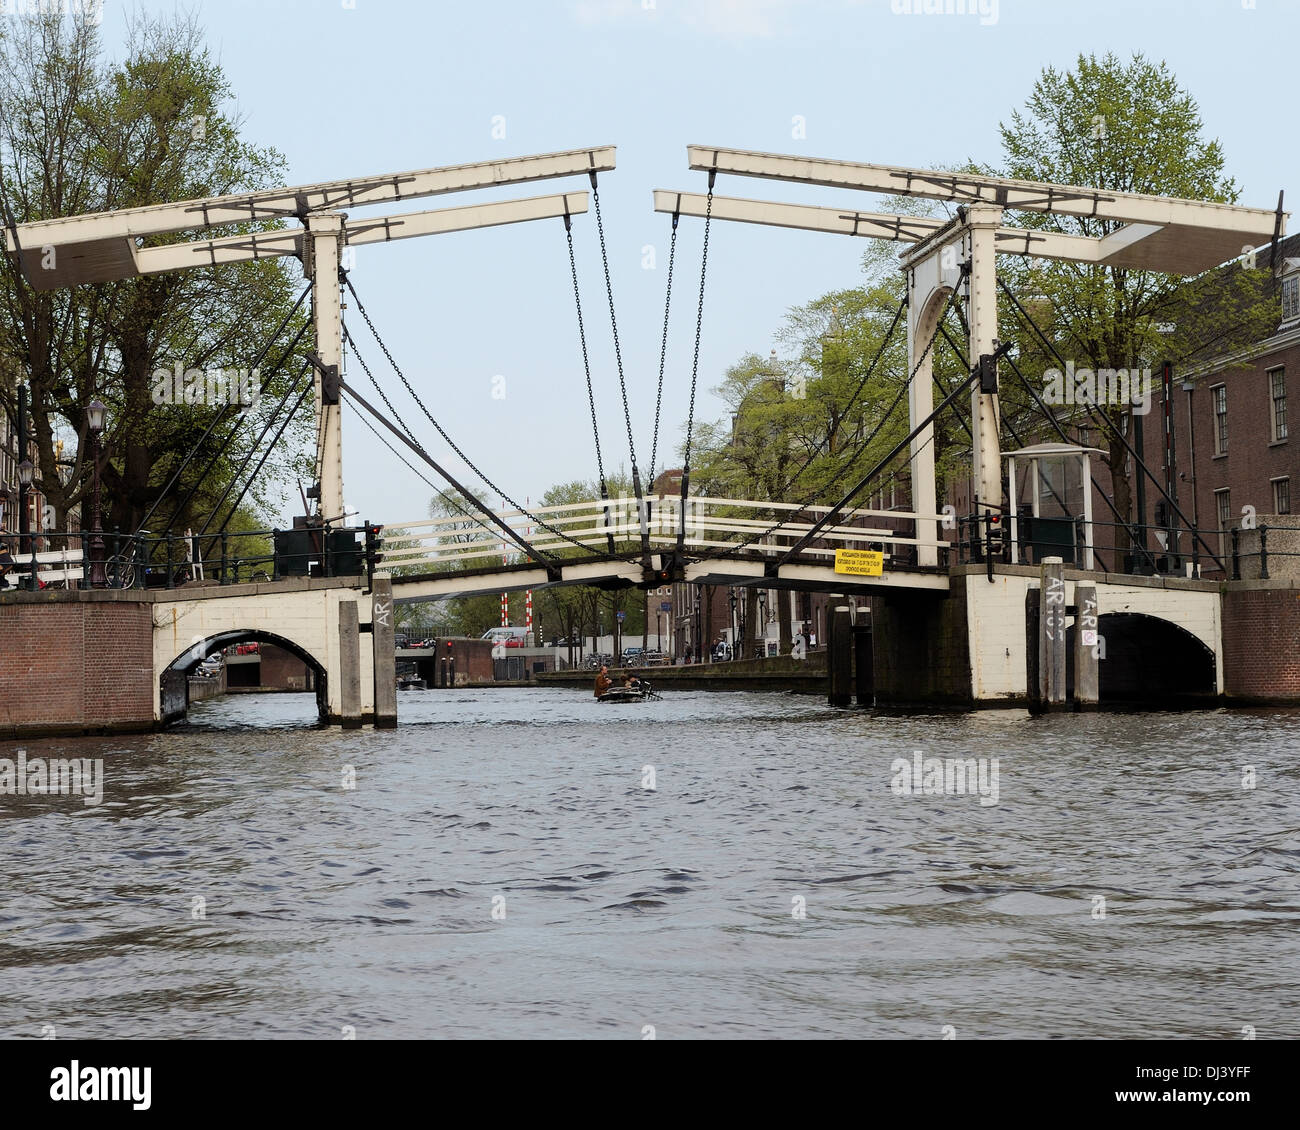 Lift Bridge - Stock Image